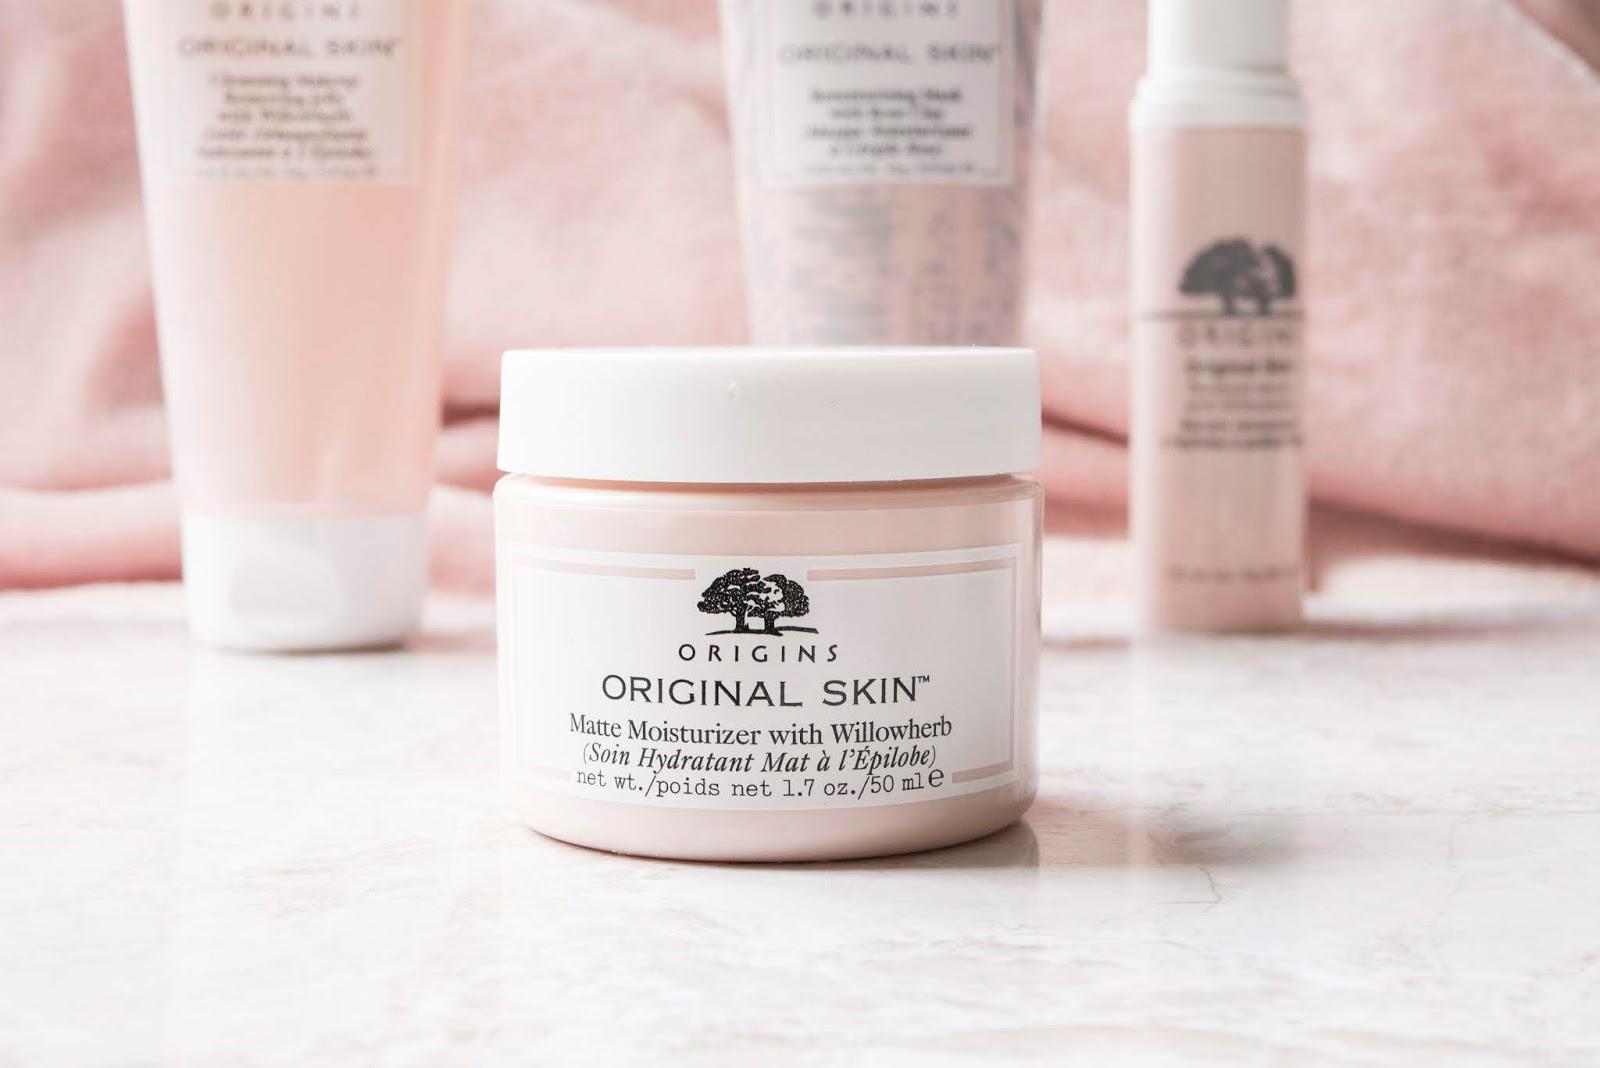 Origins - Original Skin